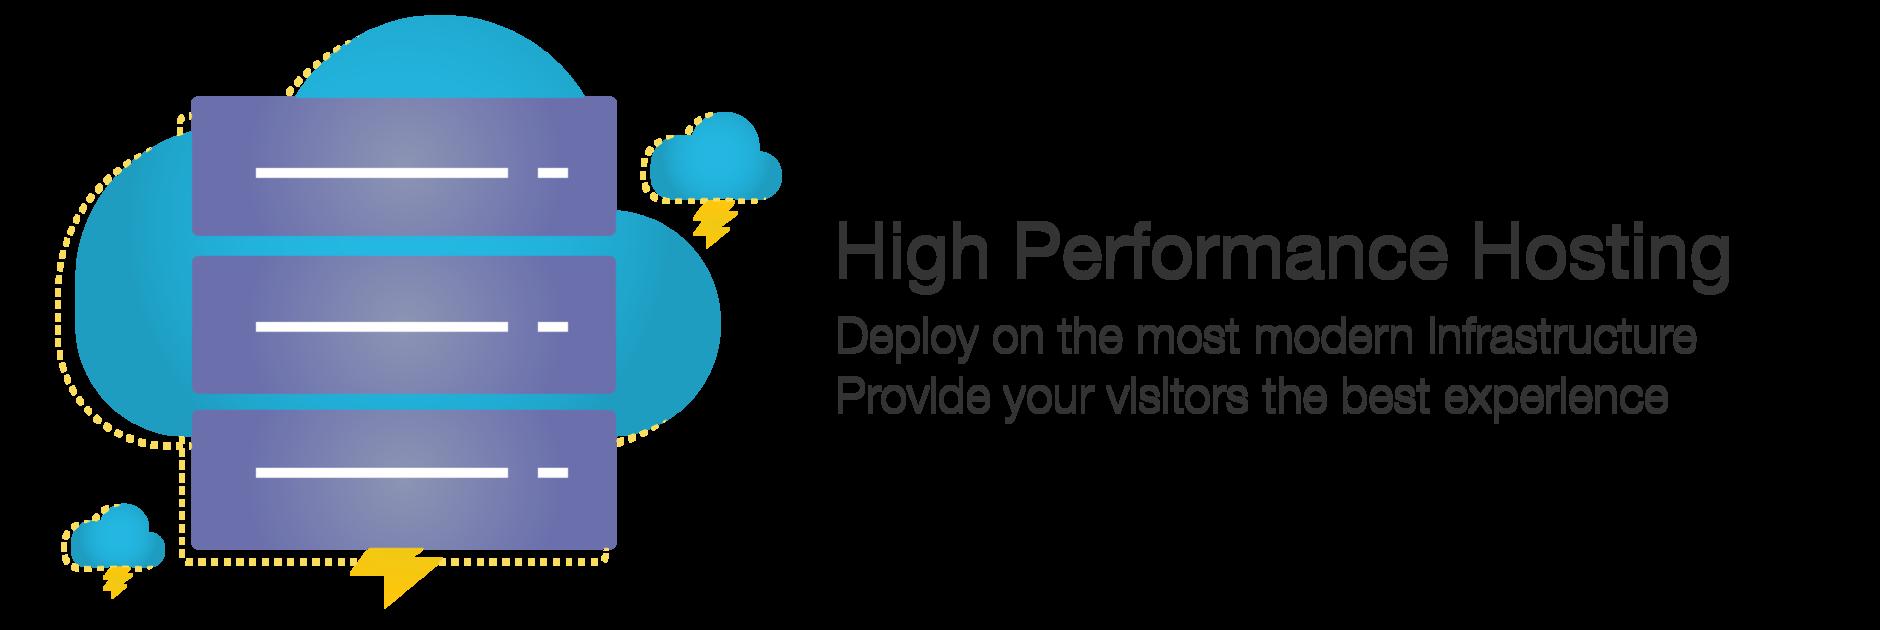 High Performance Hosting